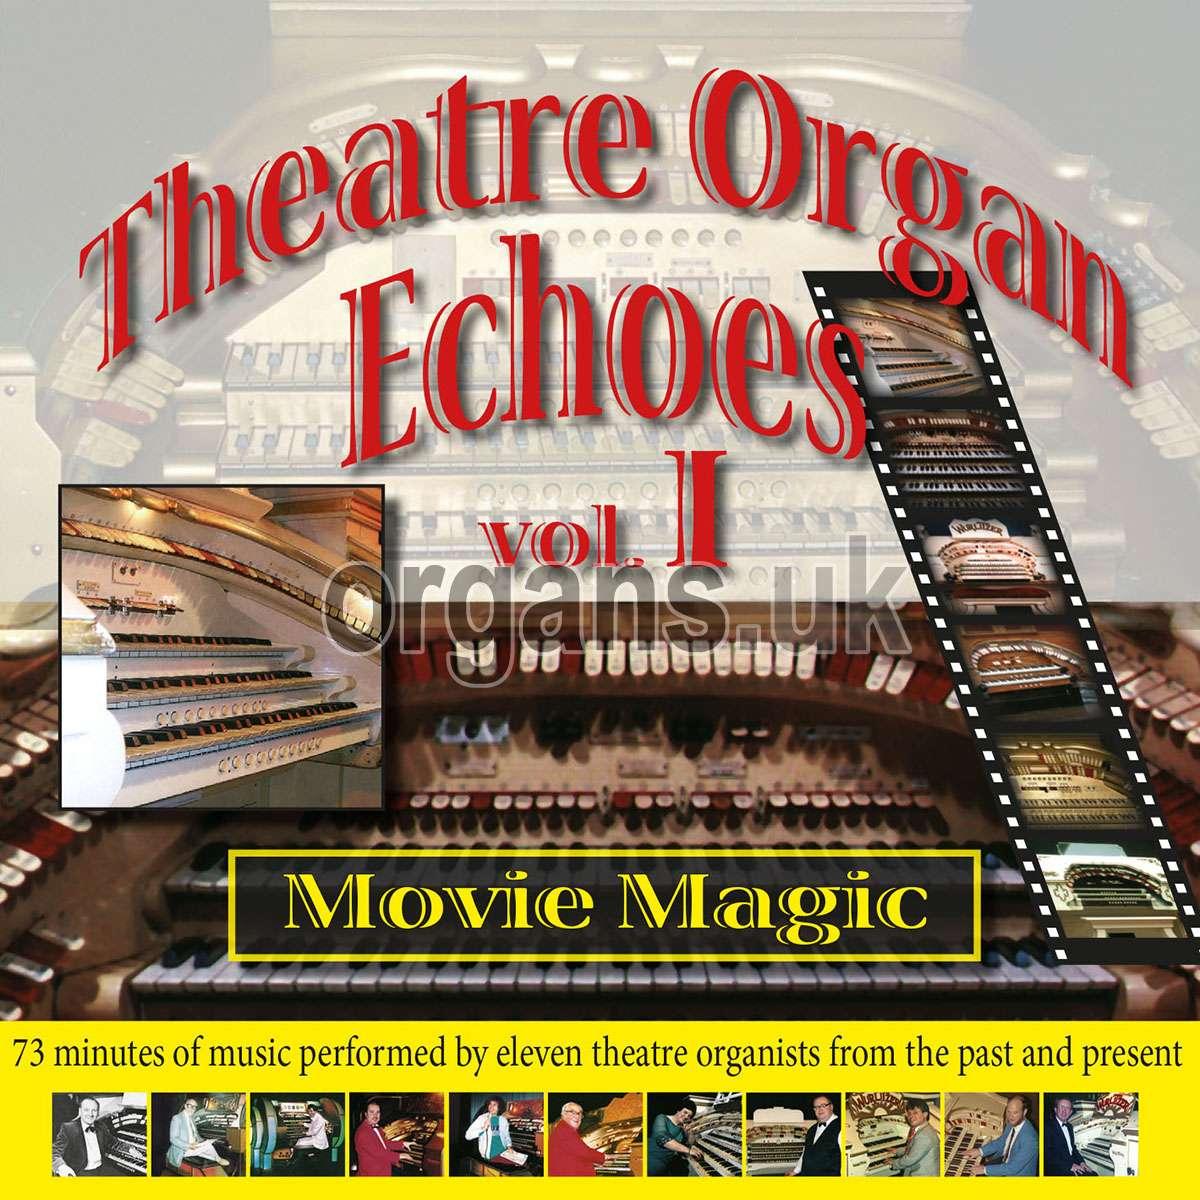 Theatre Organ Echoes 1 - Movie Magic